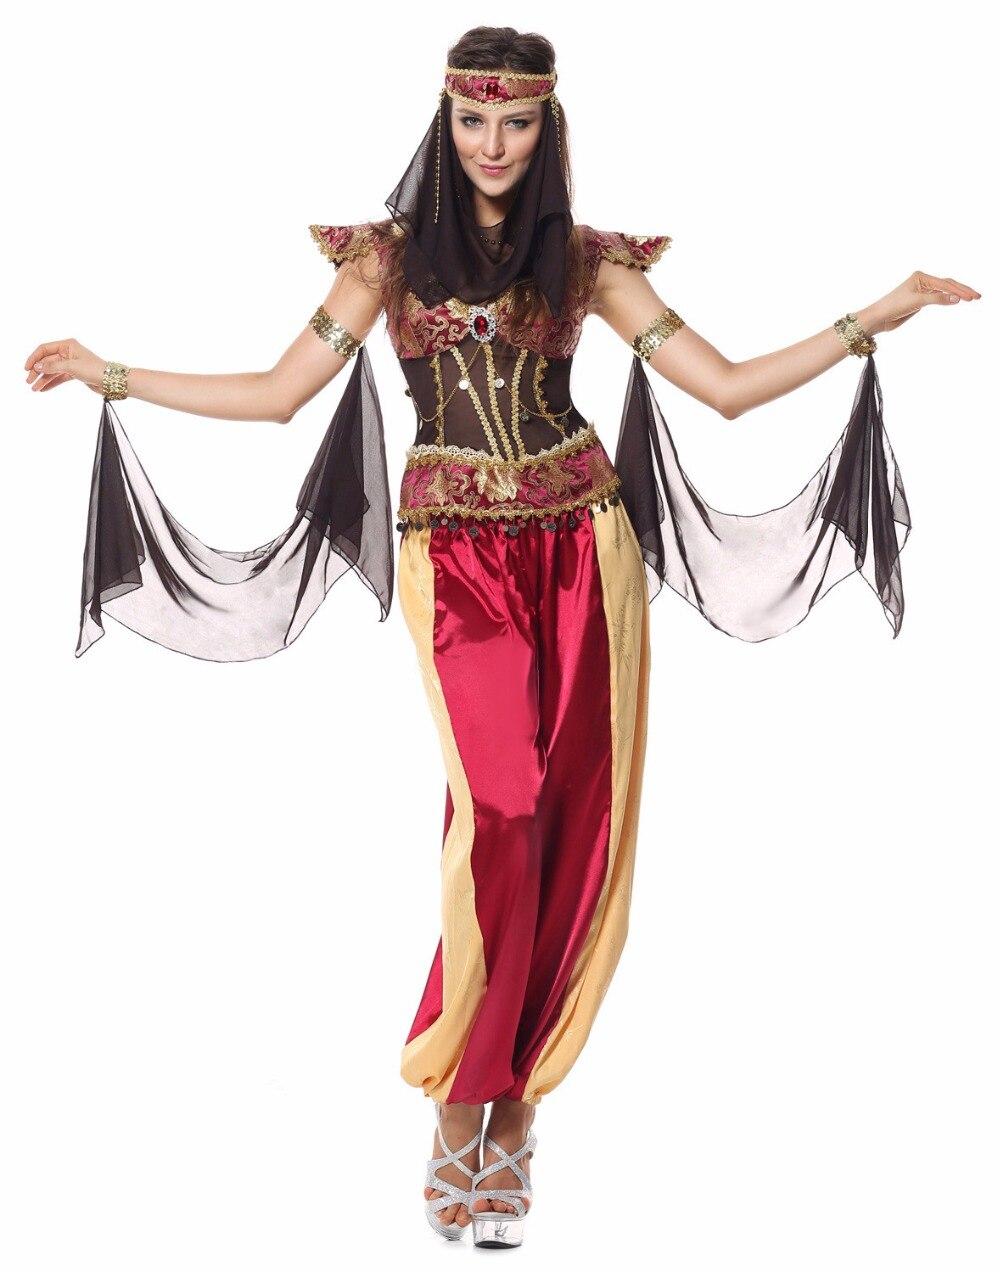 delle donne regina egiziana costume dea greca costume di halloween cleopatra costumi delle donne roman empress